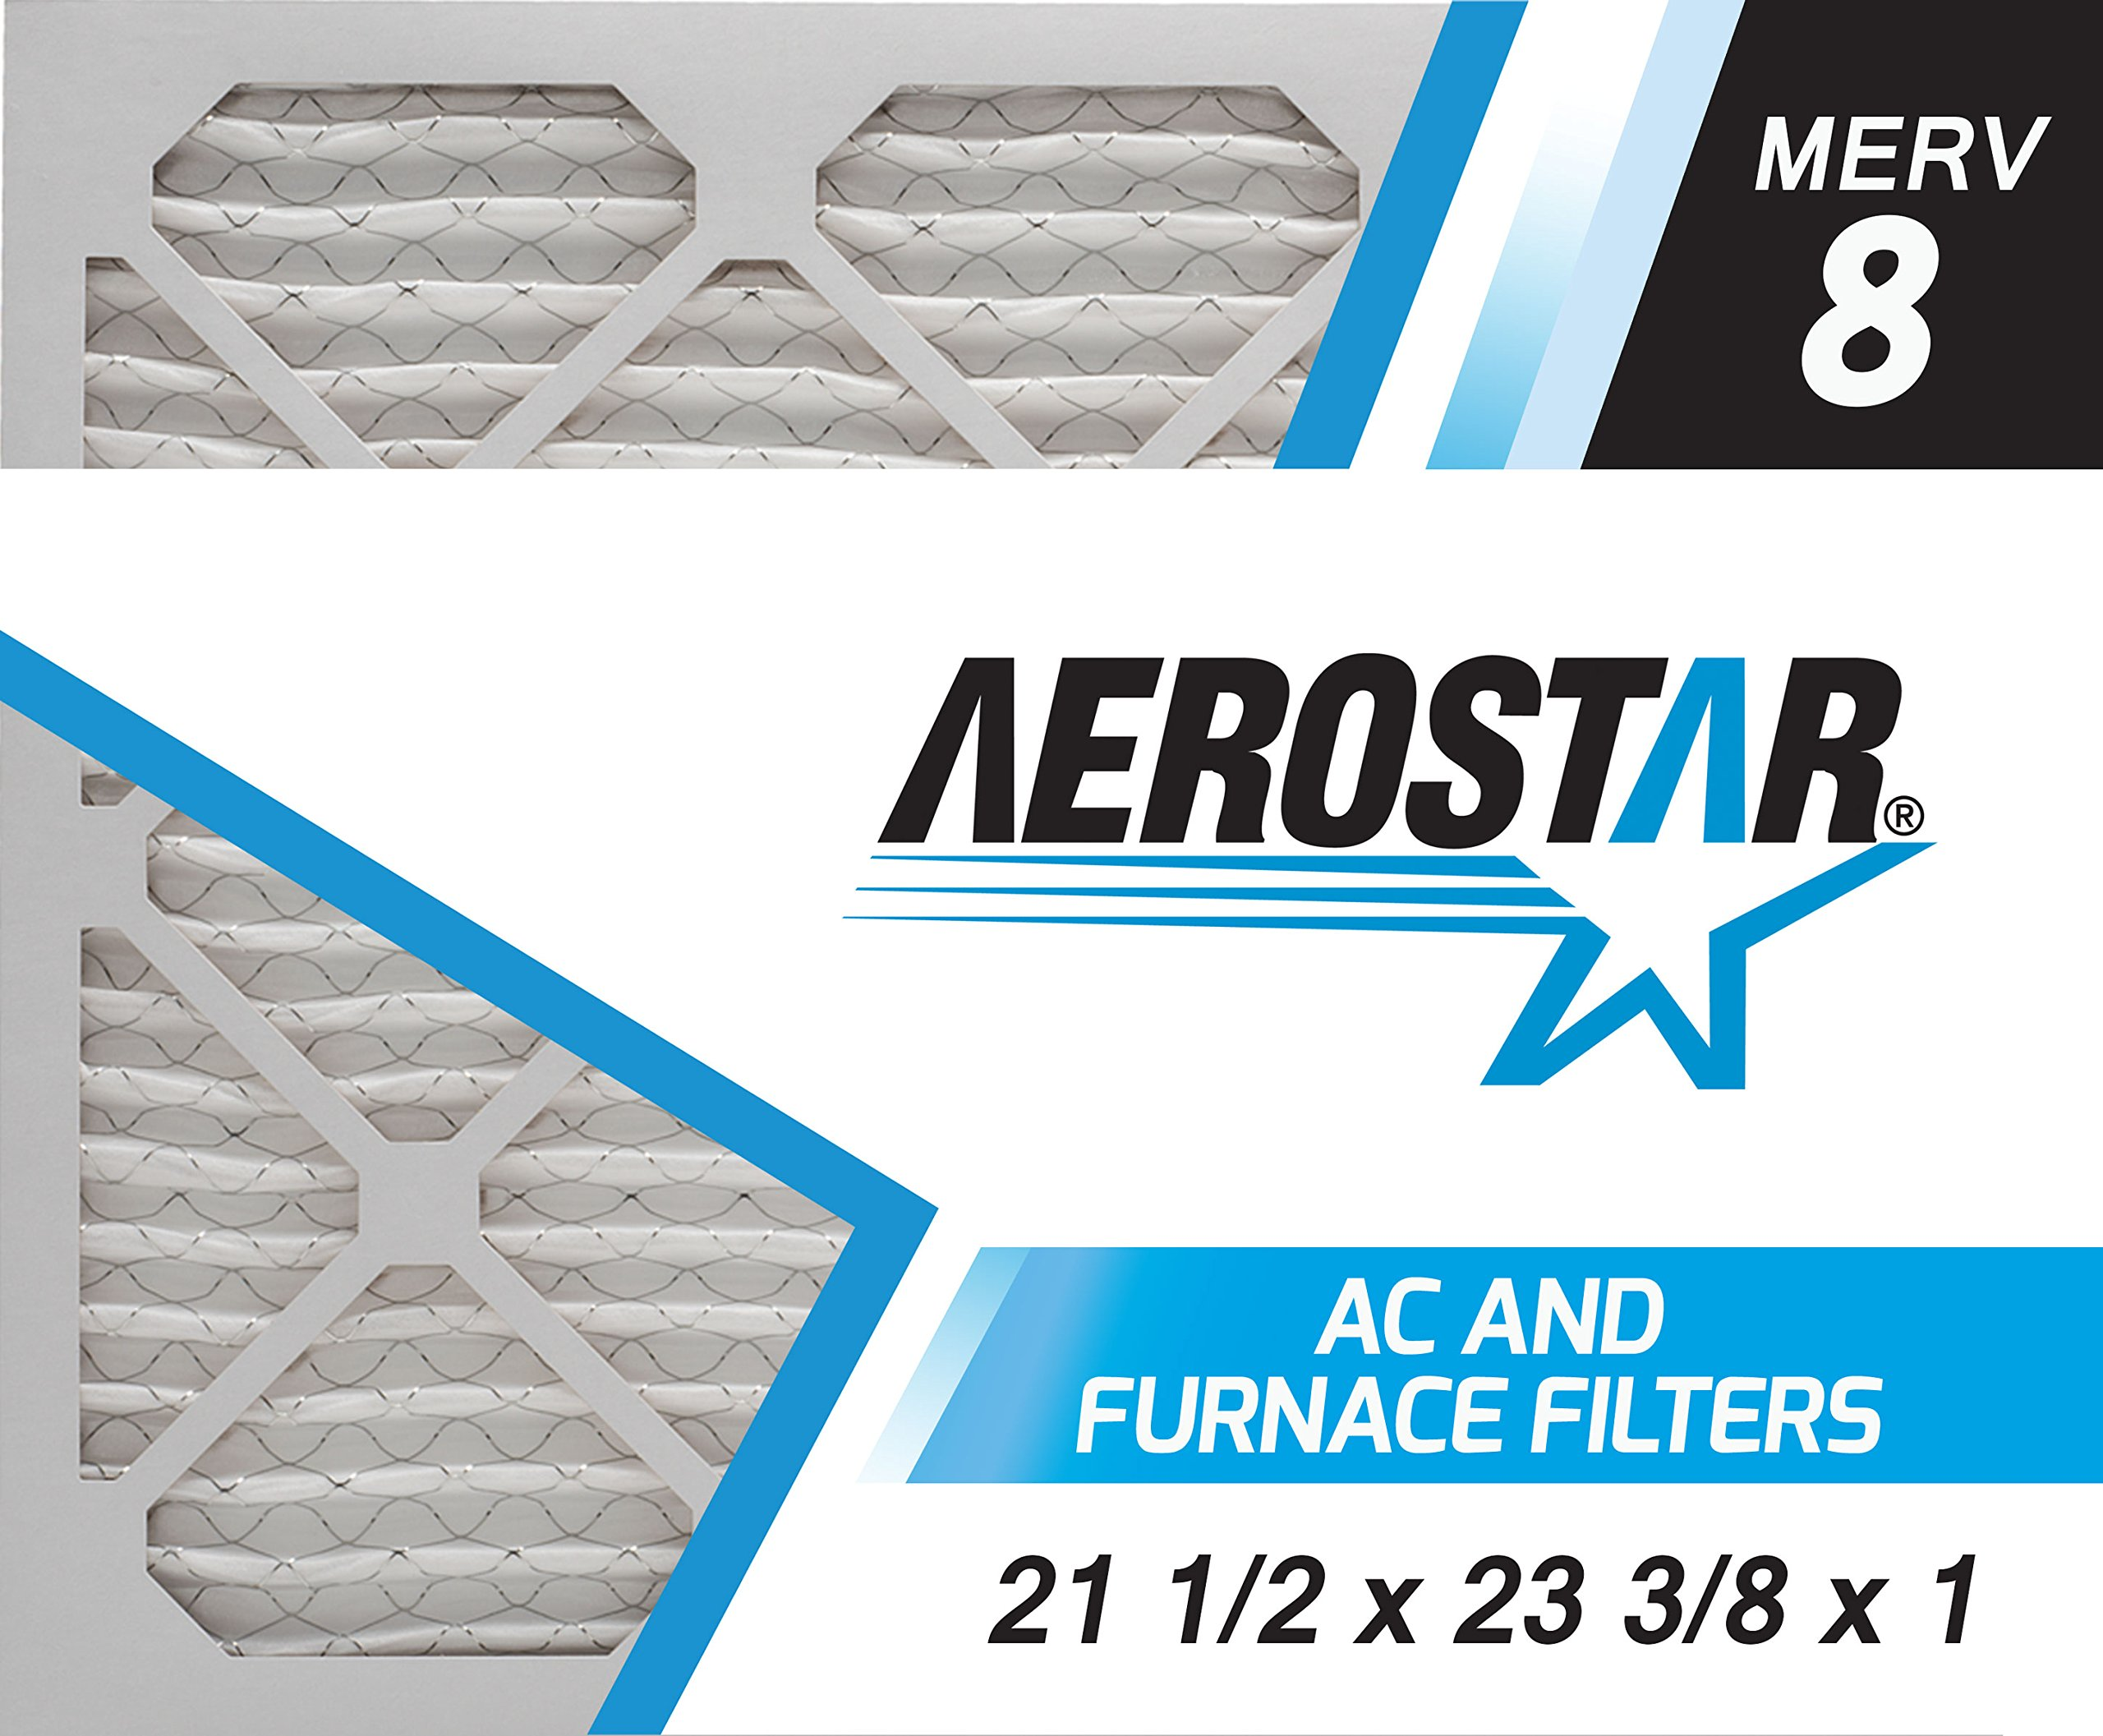 Aerostar 21 1/2x23 3/8x1 MERV 8, Pleated Air Filter, 21 1/2 x 23 3/8 x 1, Box of 6, Made in The USA